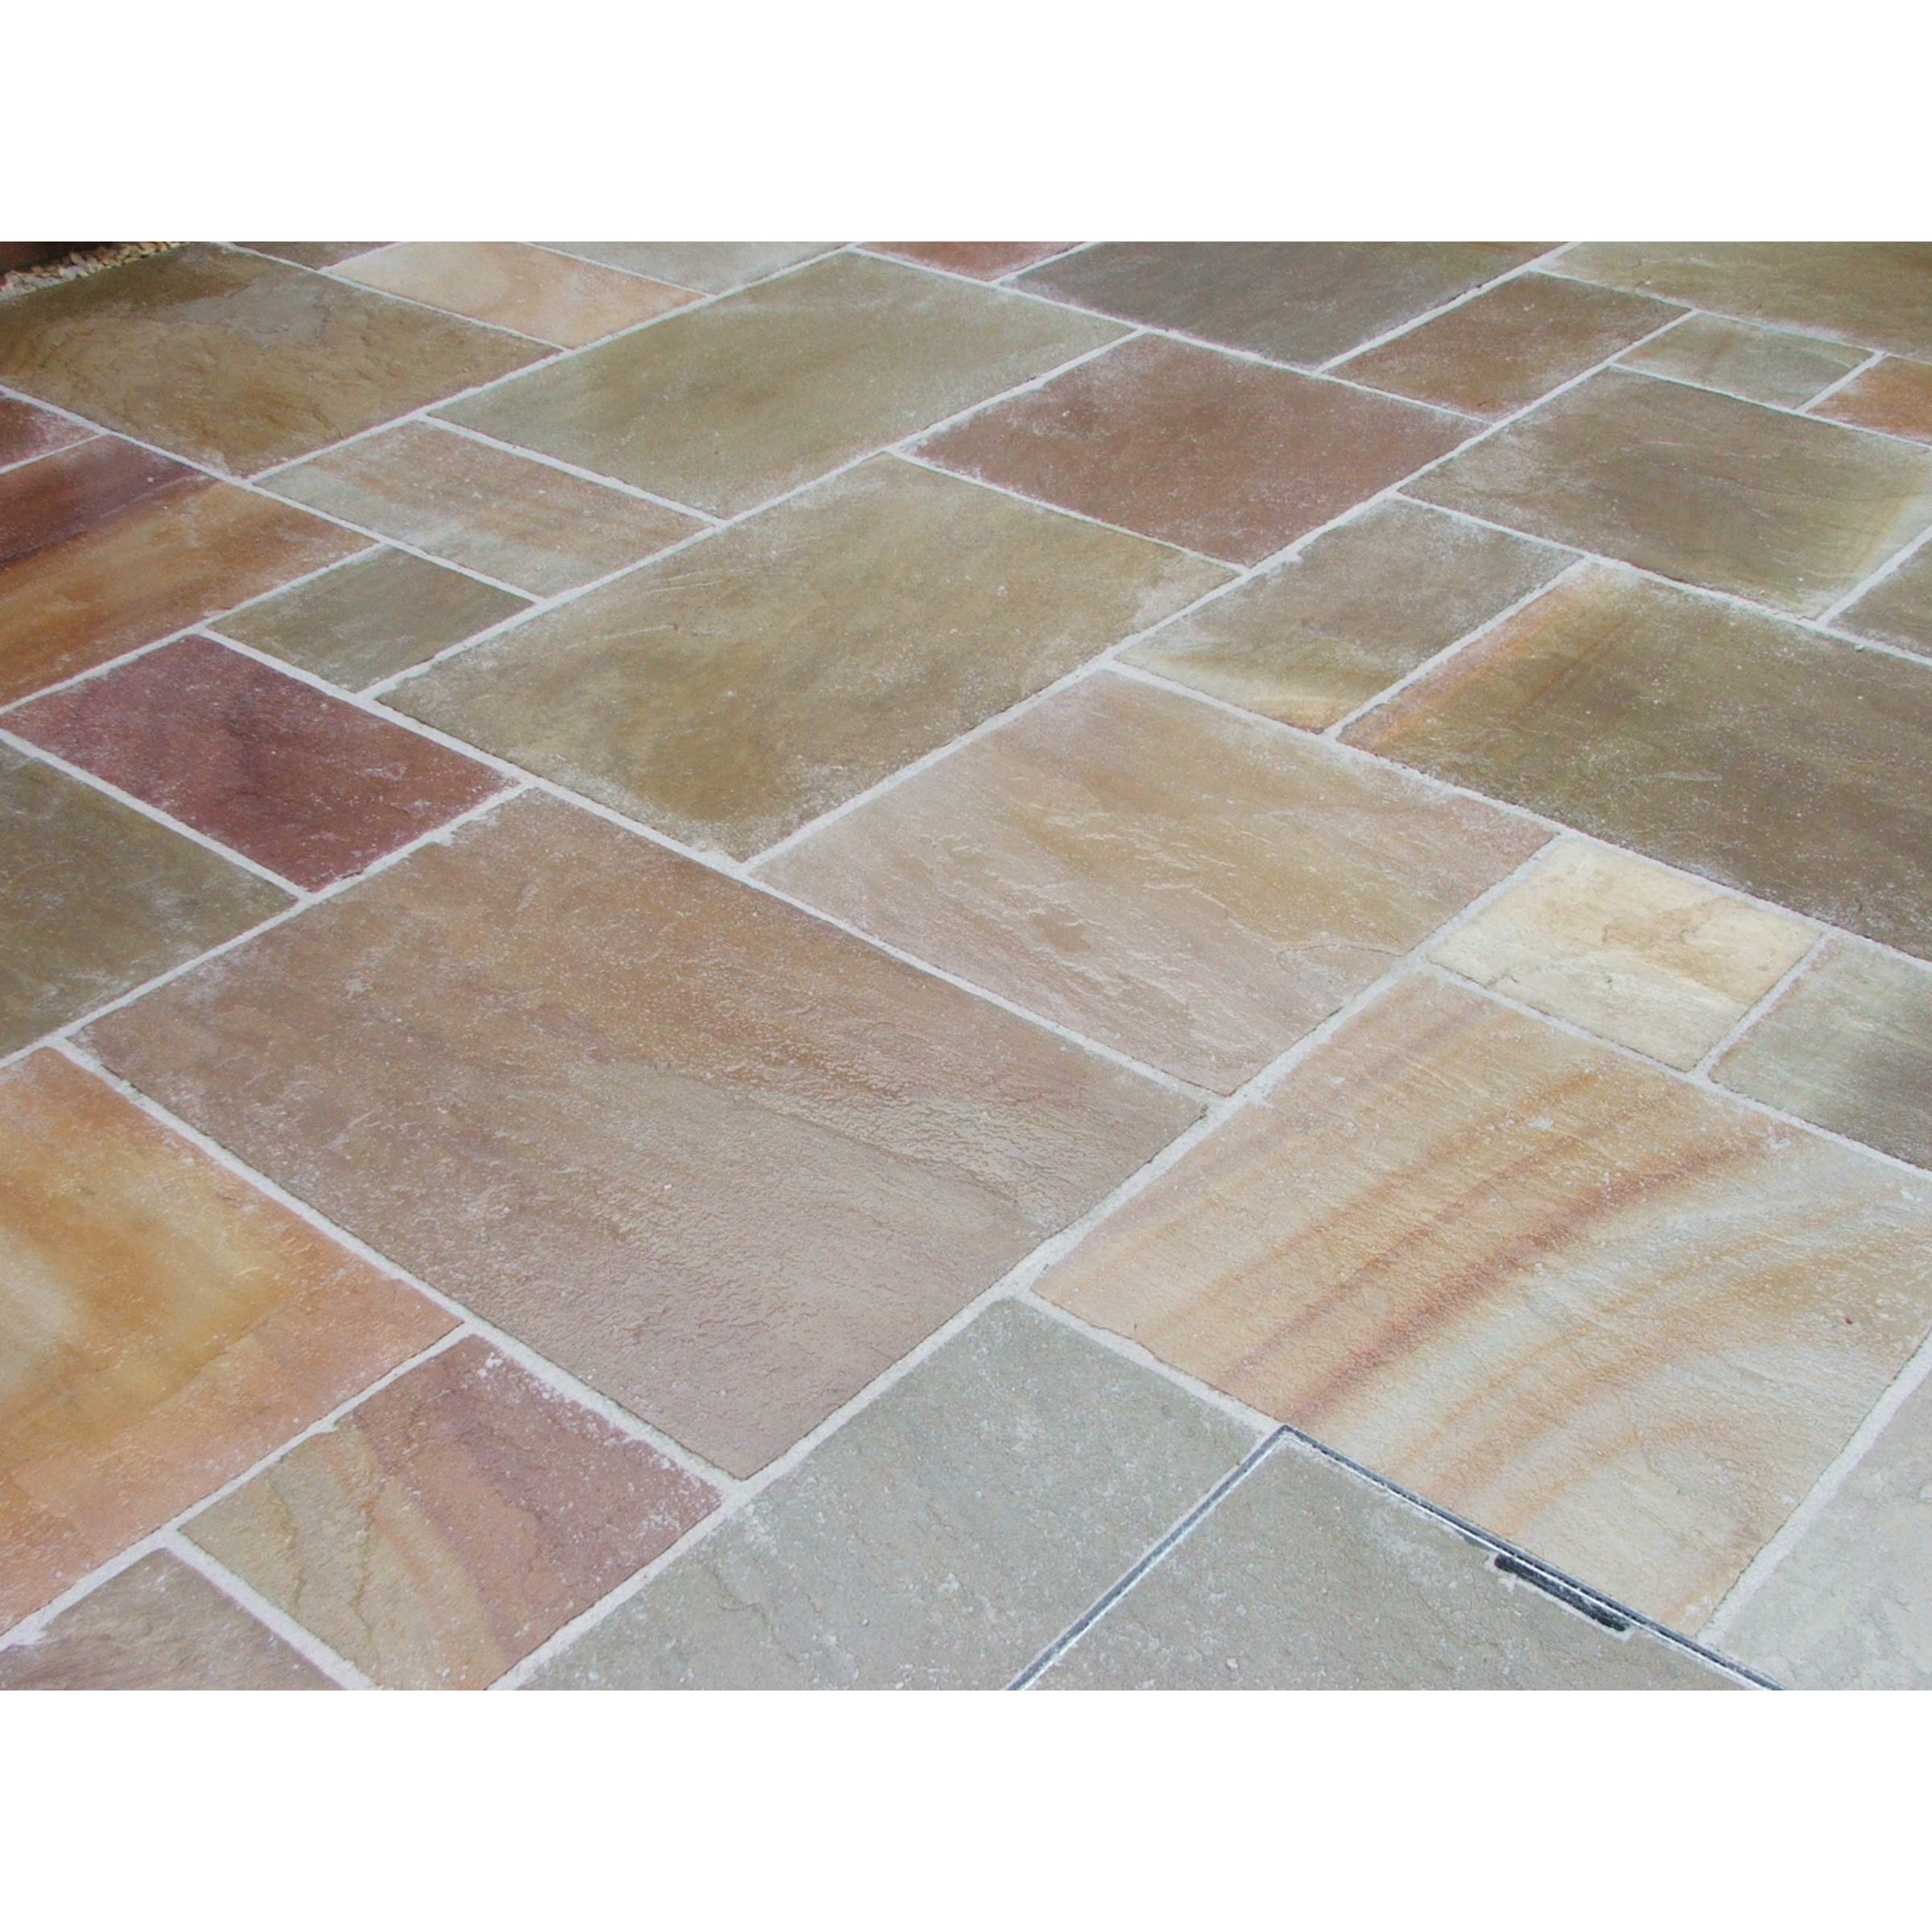 Sandstone / Natural Stone Sealer   U0027Colour Enhancedu0027 Finish